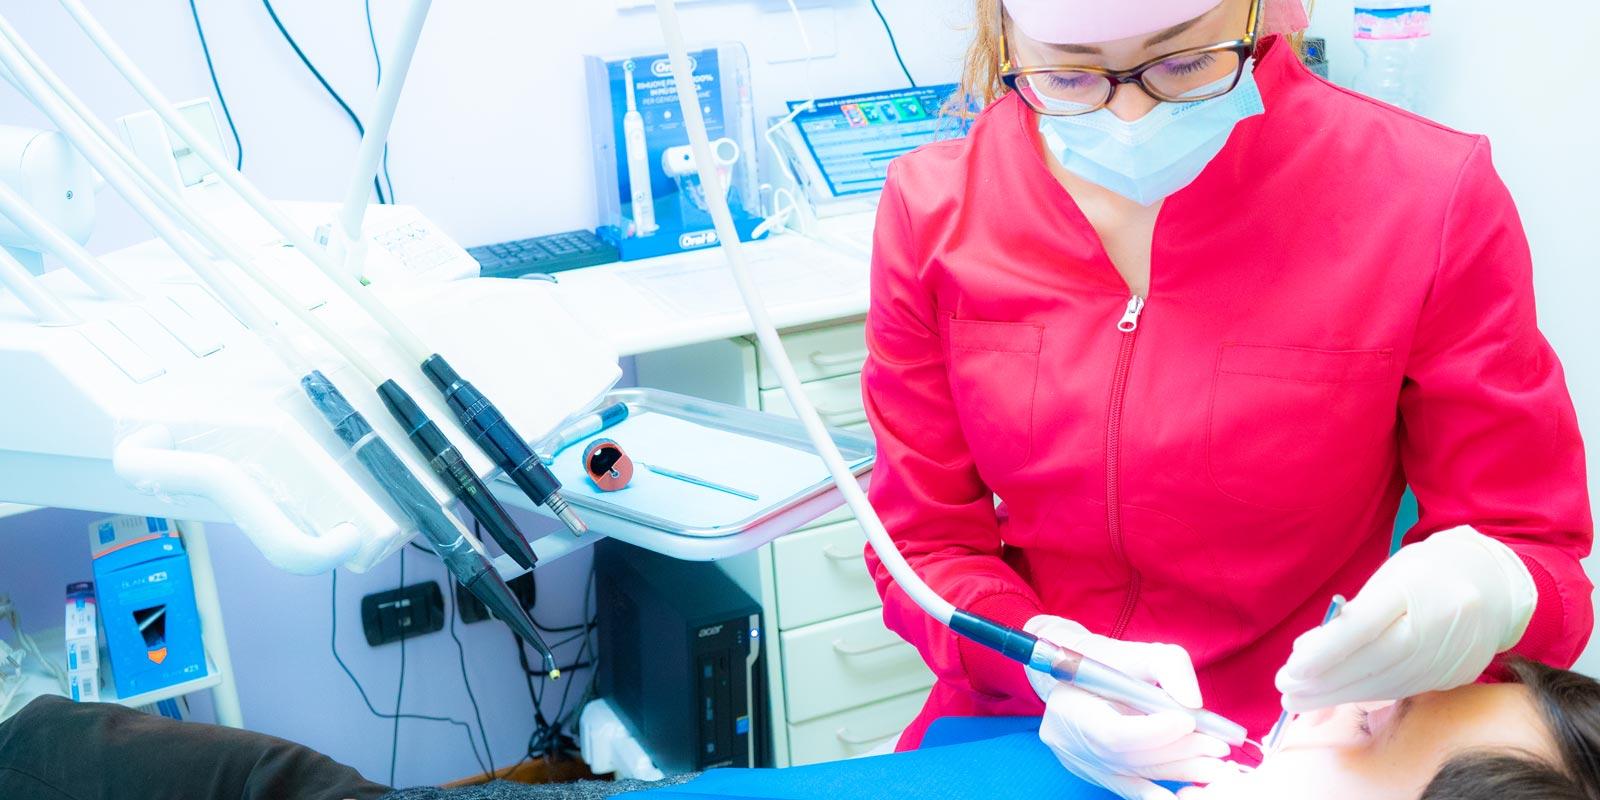 studio-dentistico-dottor-gola-casteggio-odontoiatria-pavia-dentista-implantologia-ortodonzia-protesi-chirurgia-55